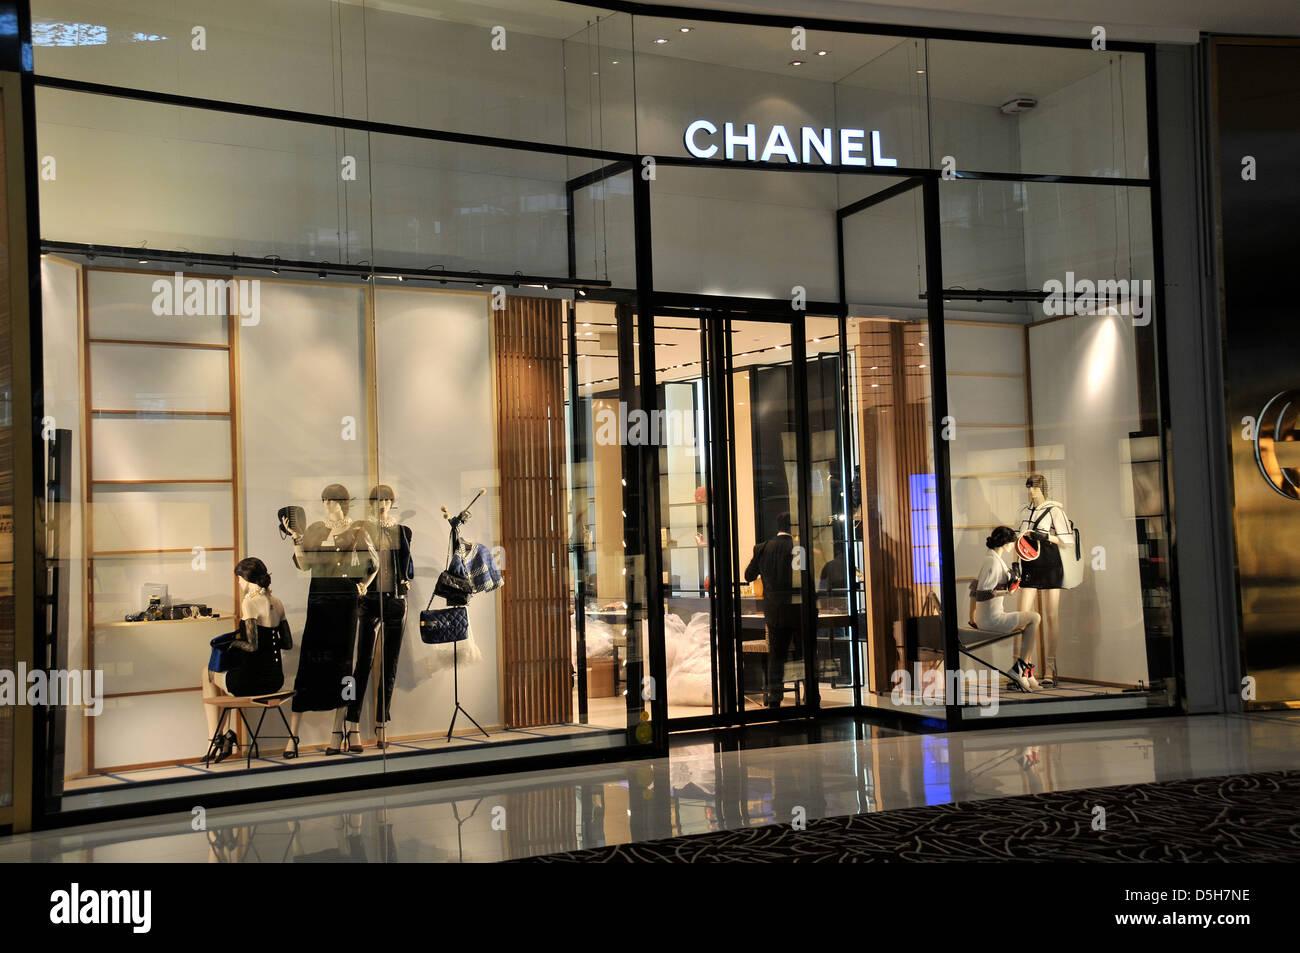 Chanel boutique Dubai mall Dubai UAE - Stock Image